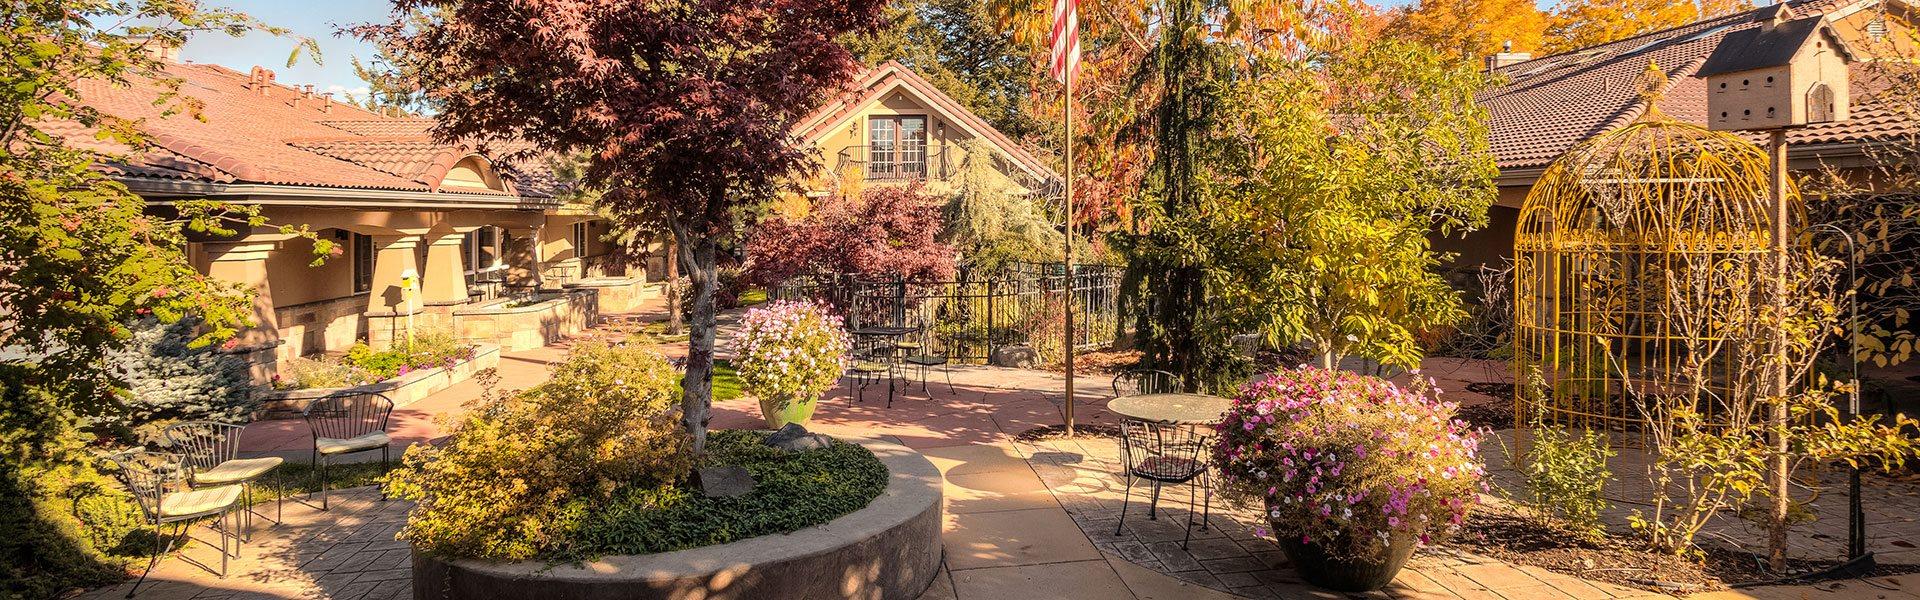 Beautiful Garden Setting at Courtyard at Coeur d'Alene, Idaho, 83814